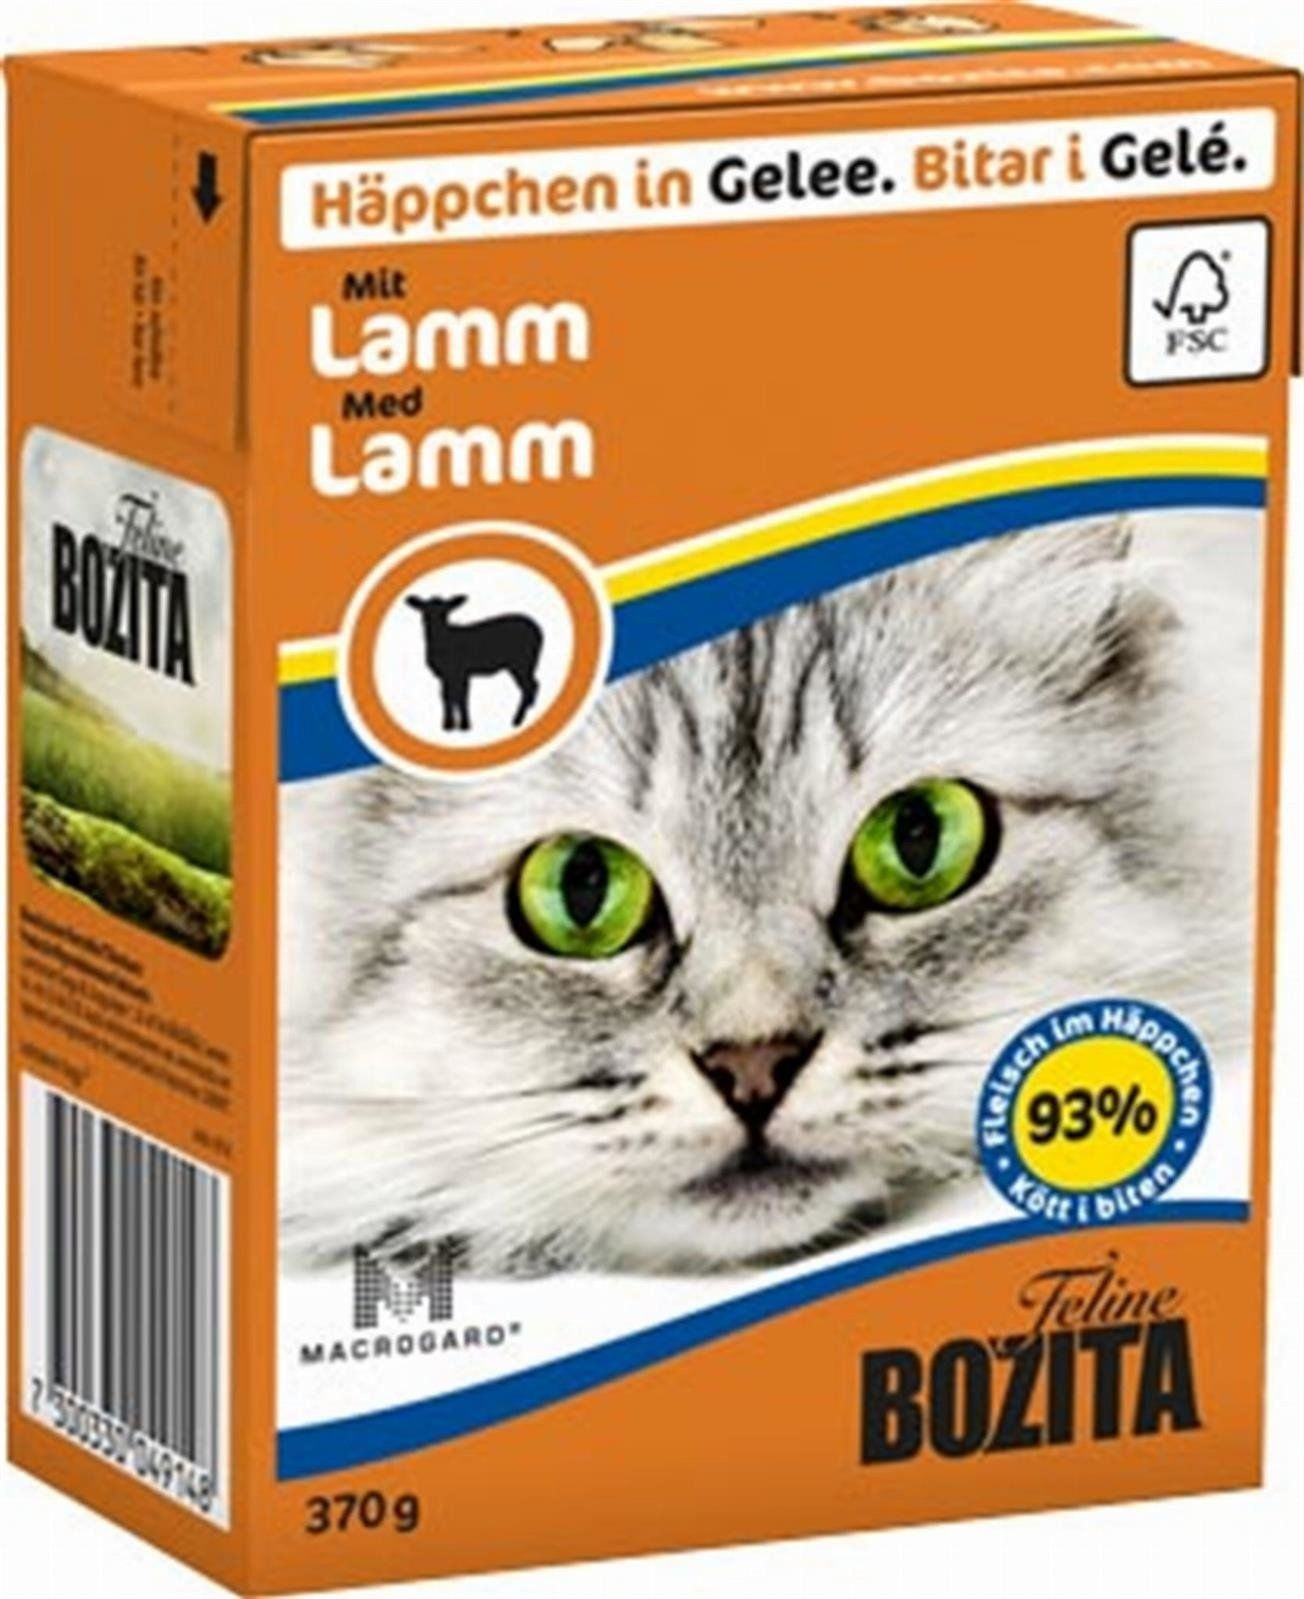 Bozita Feline 370g Jagnięcina w Galaretce